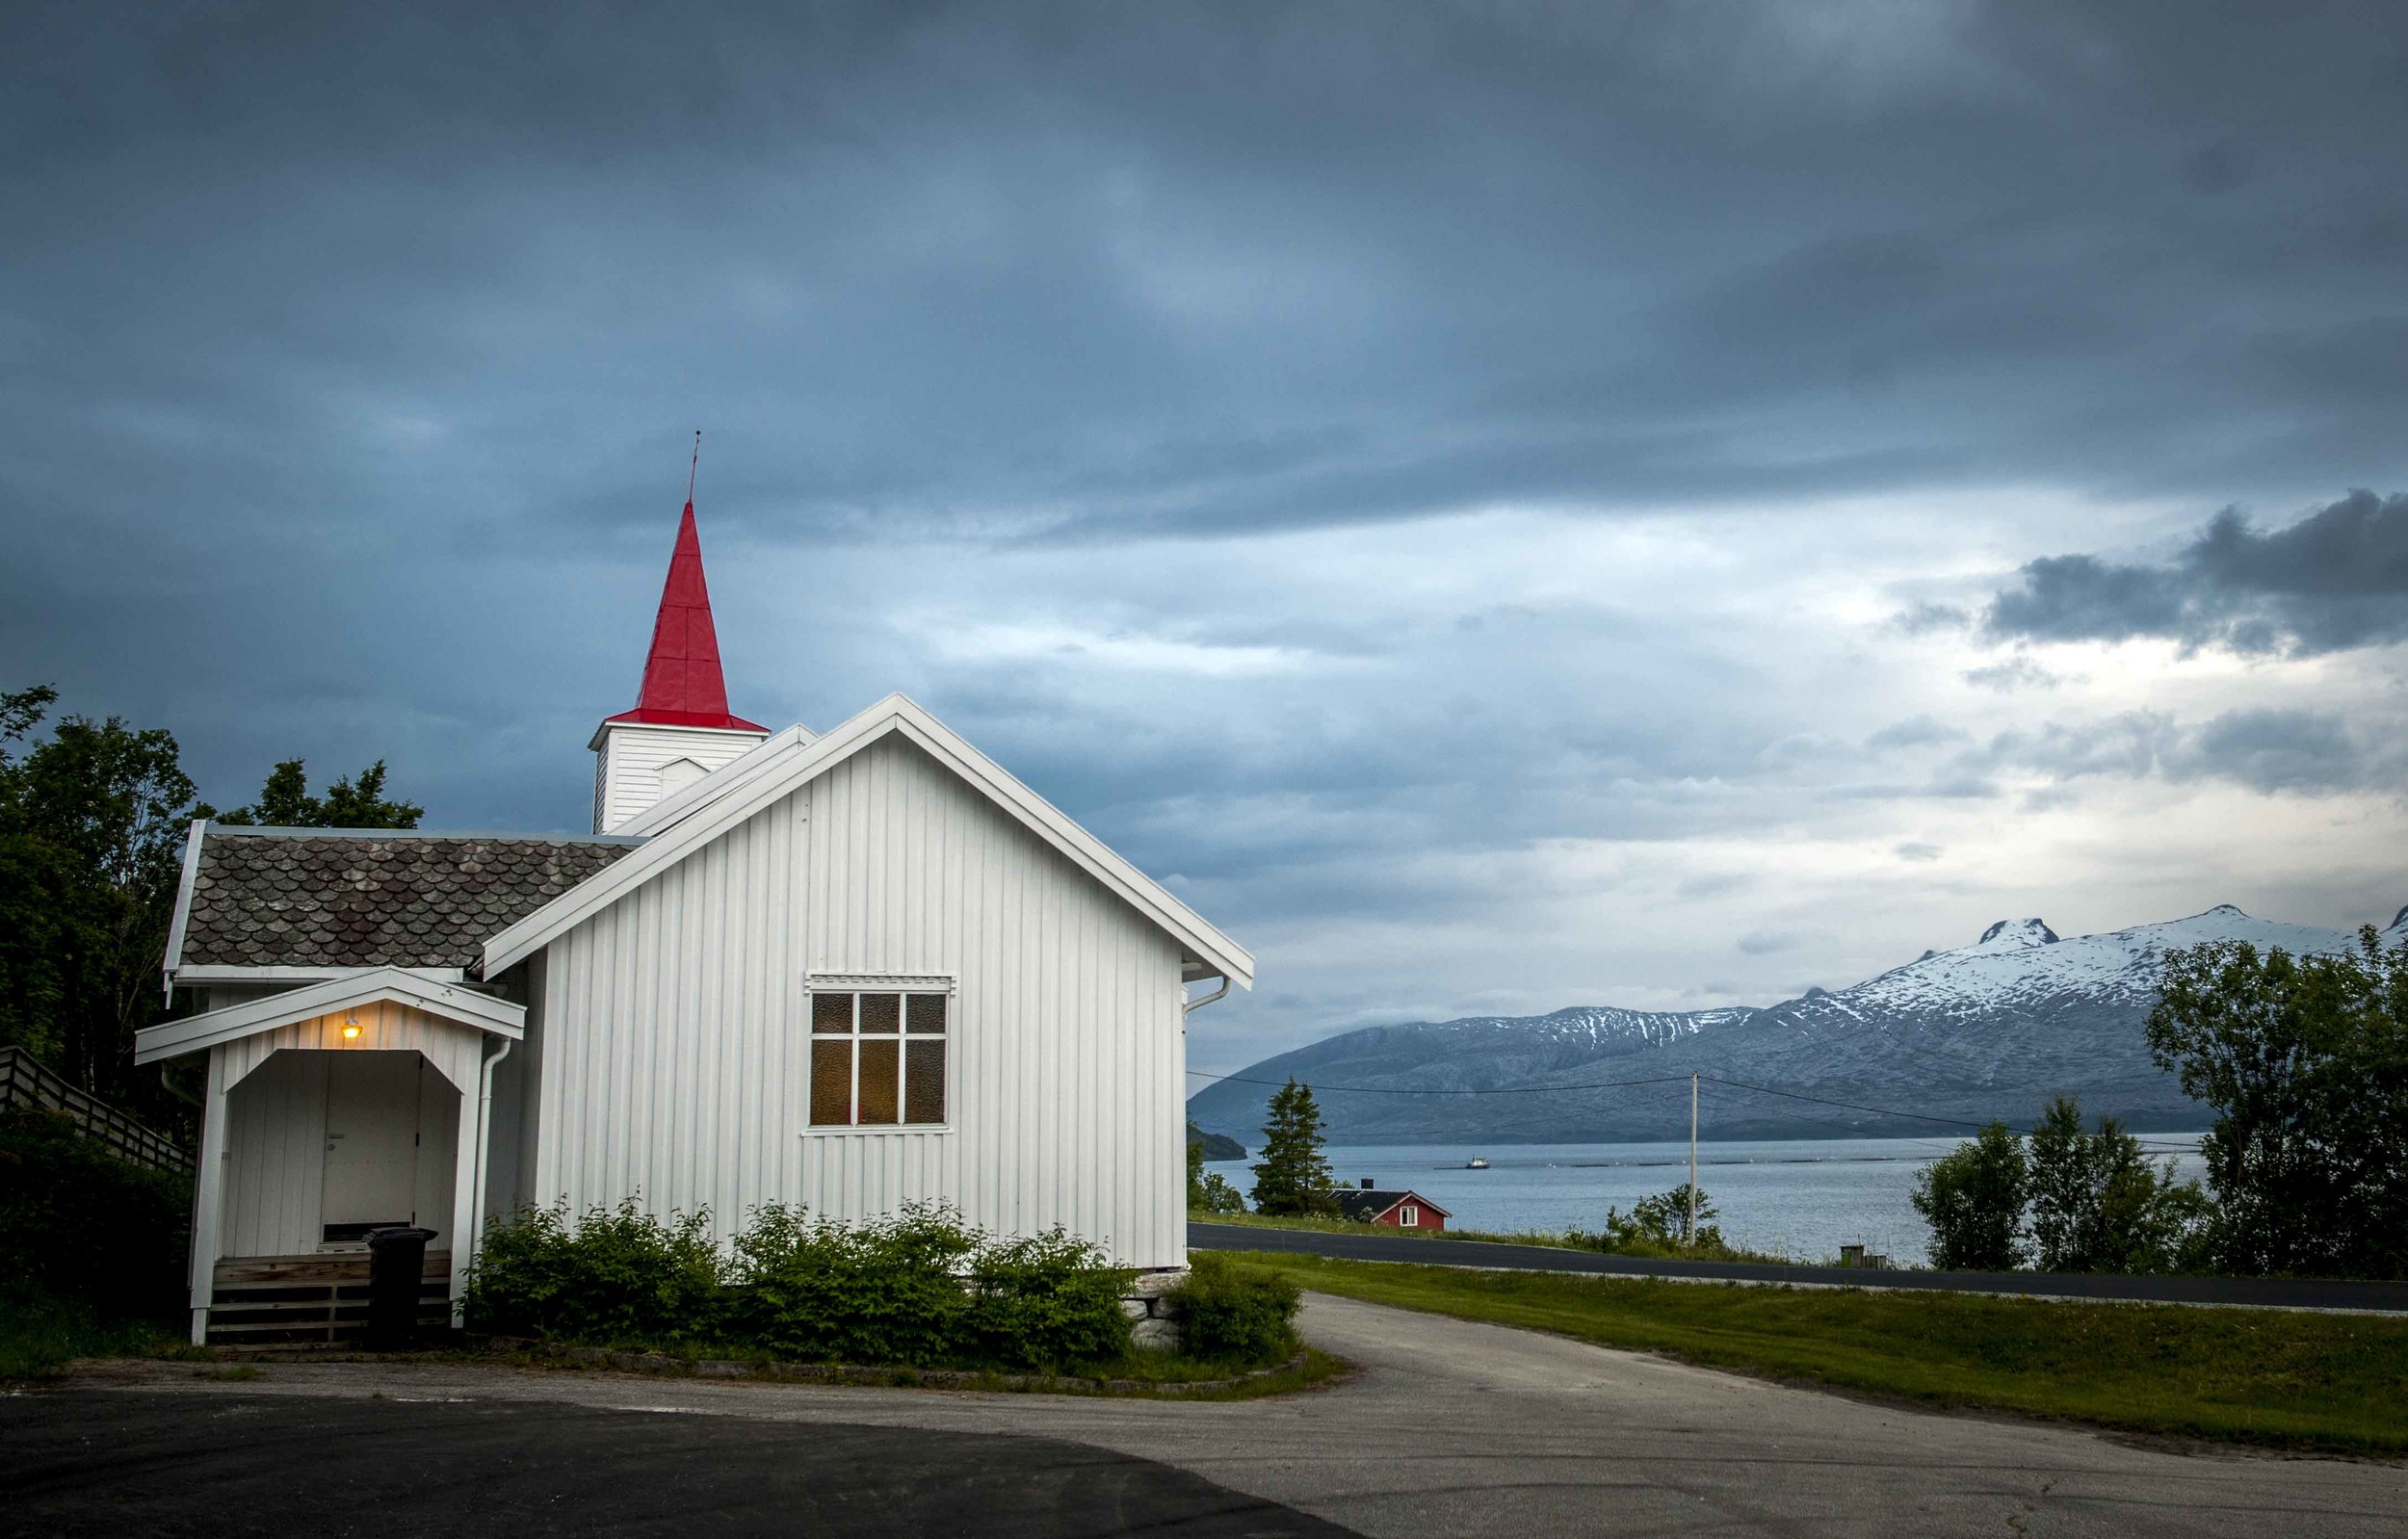 Sjona church